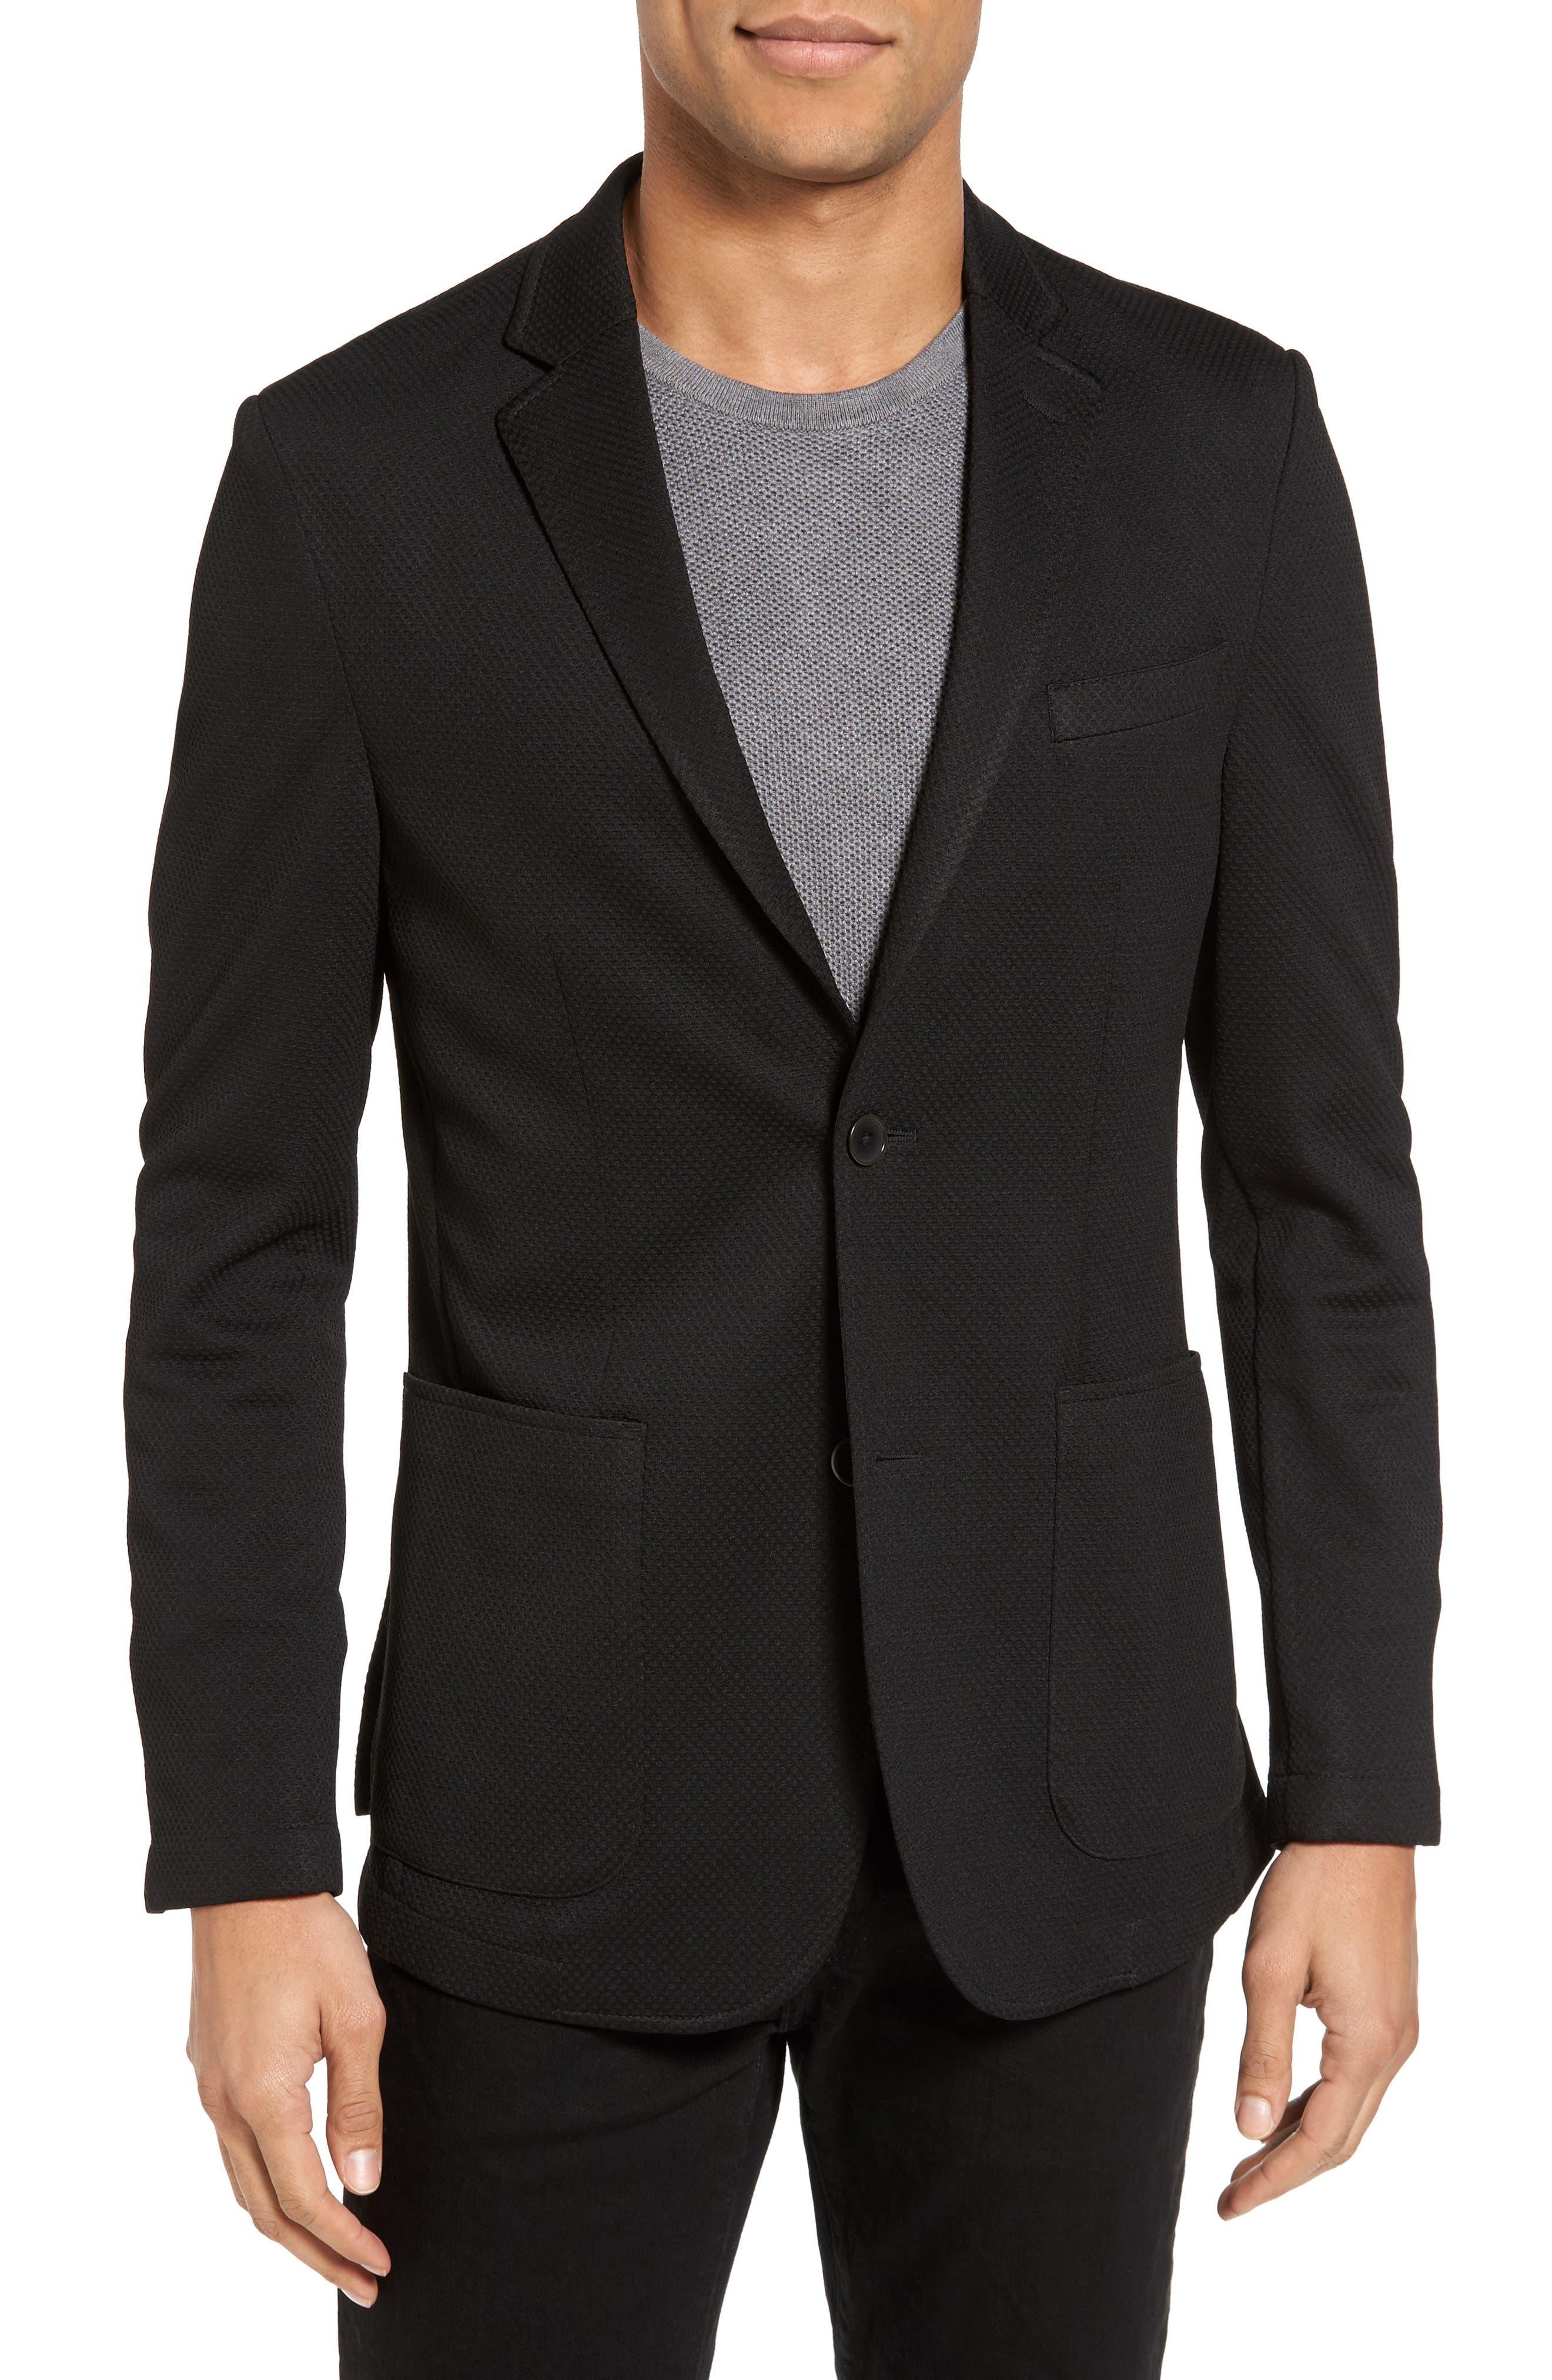 VINCE CAMUTO, Slim Fit Stretch Knit Sport Coat, Main thumbnail 1, color, BLACK